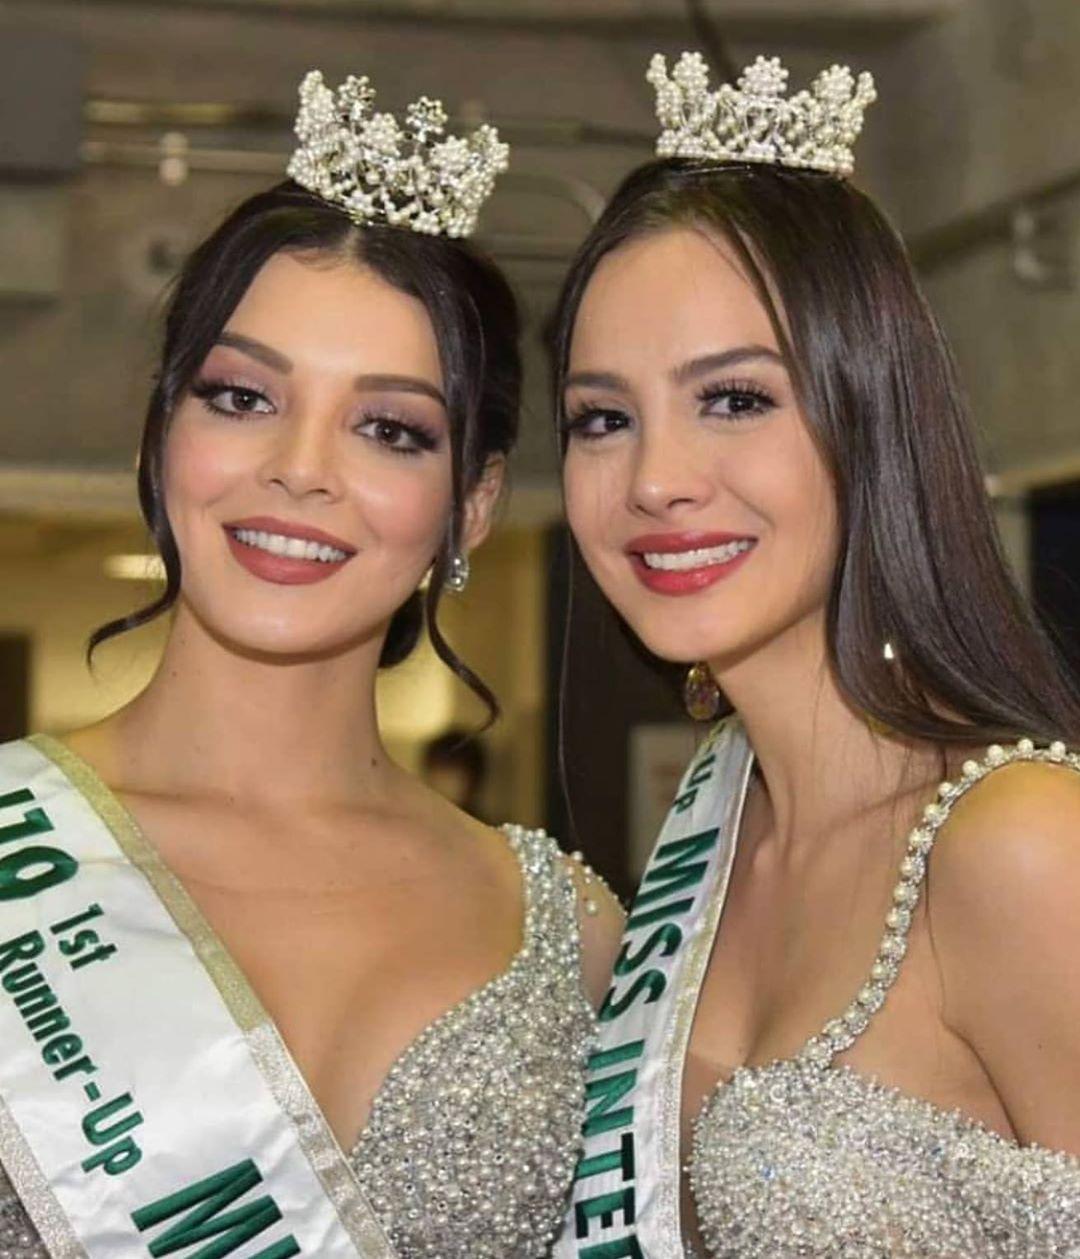 maria alejandra vengoechea, miss colombia hispanoamericana 2021/3rd runner-up de miss international 2019. - Página 11 74936914